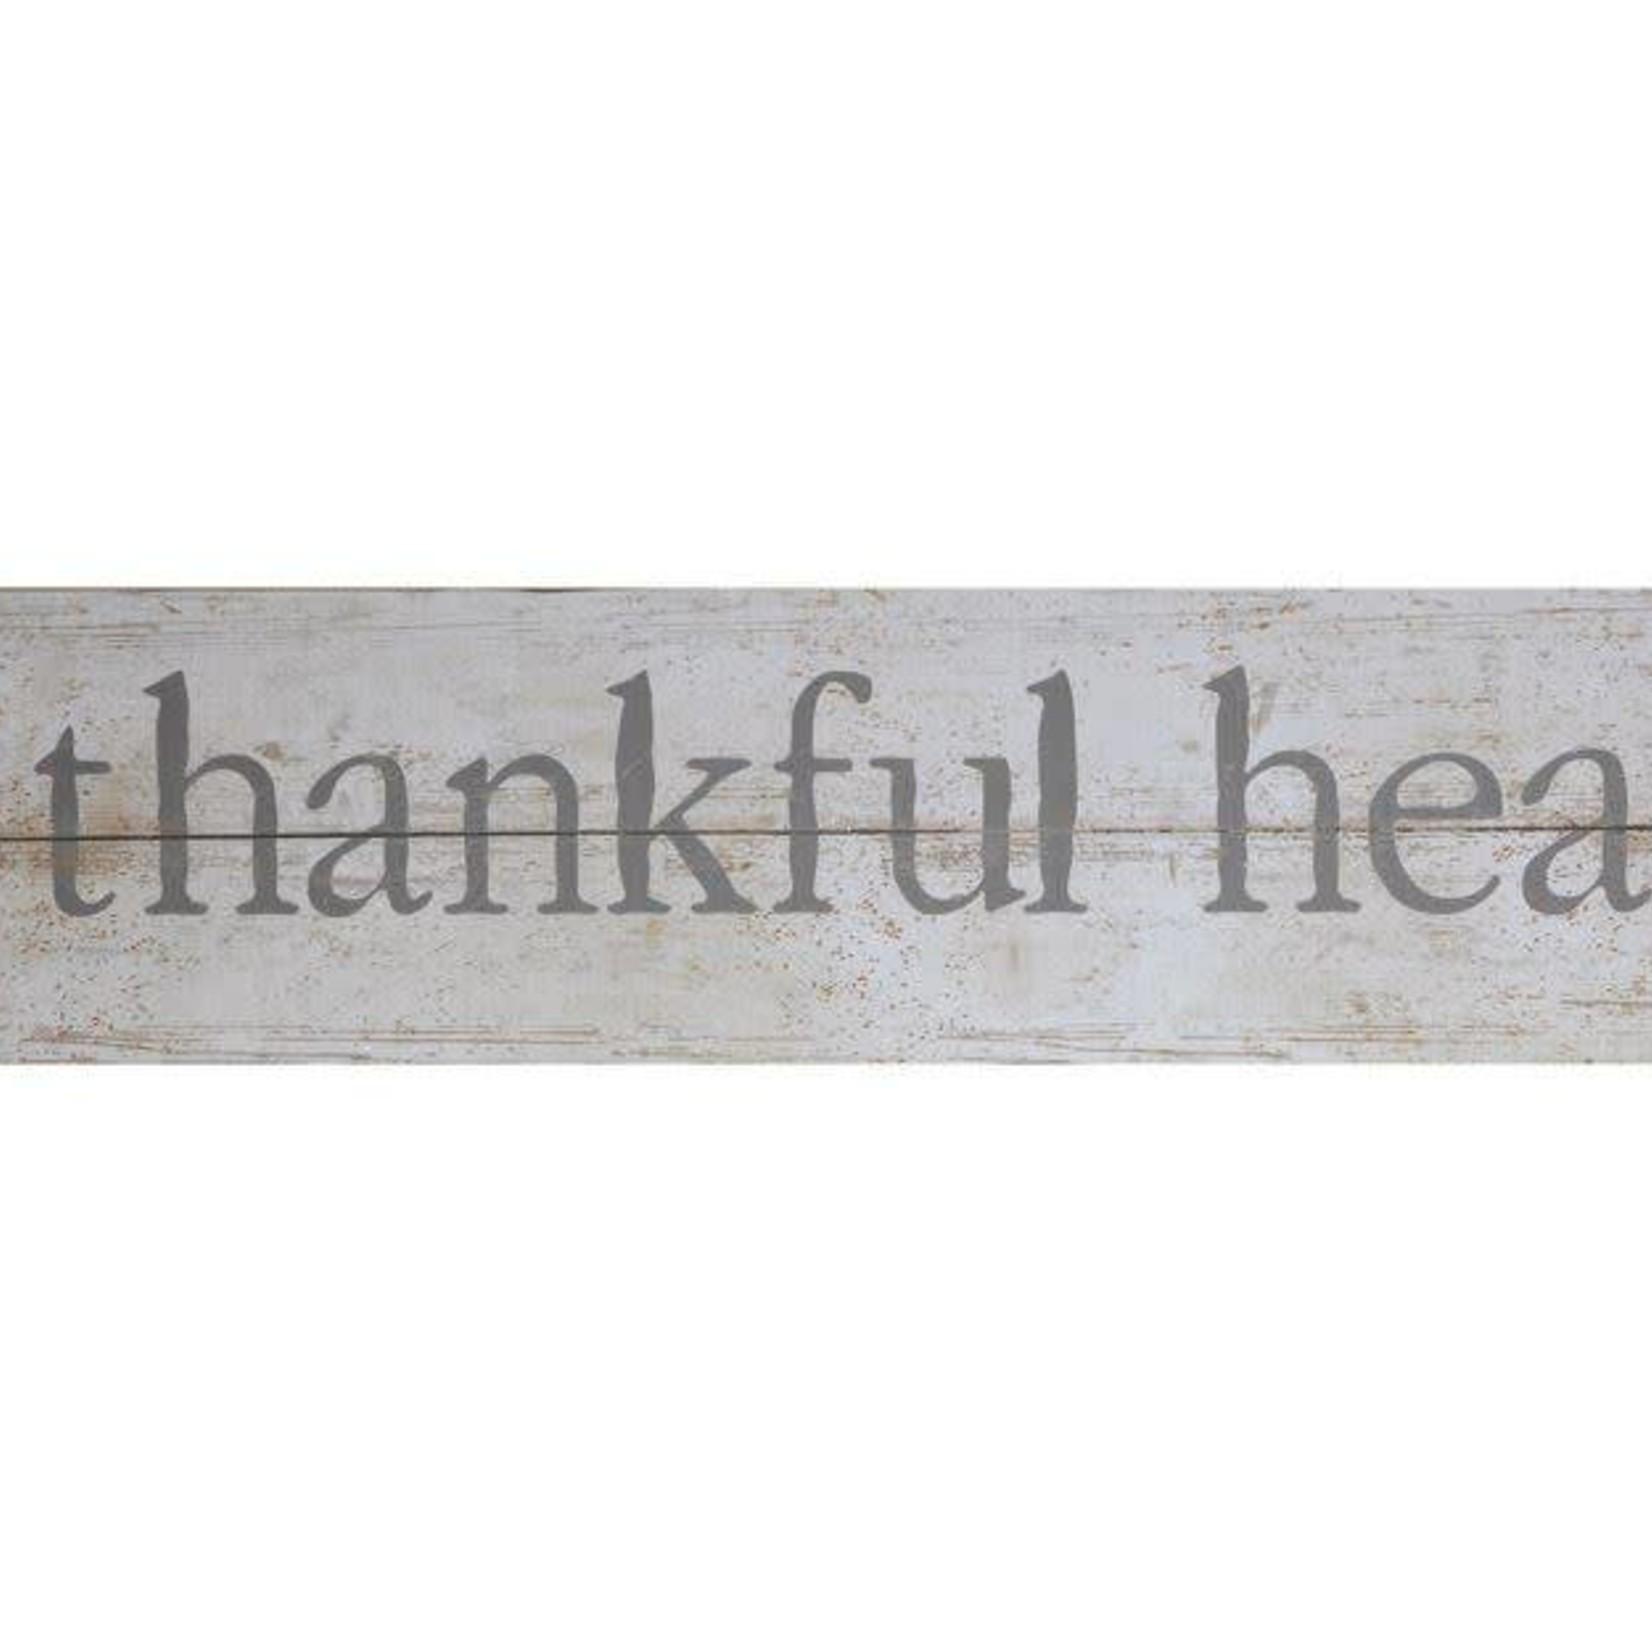 A Thankful Heart Sign